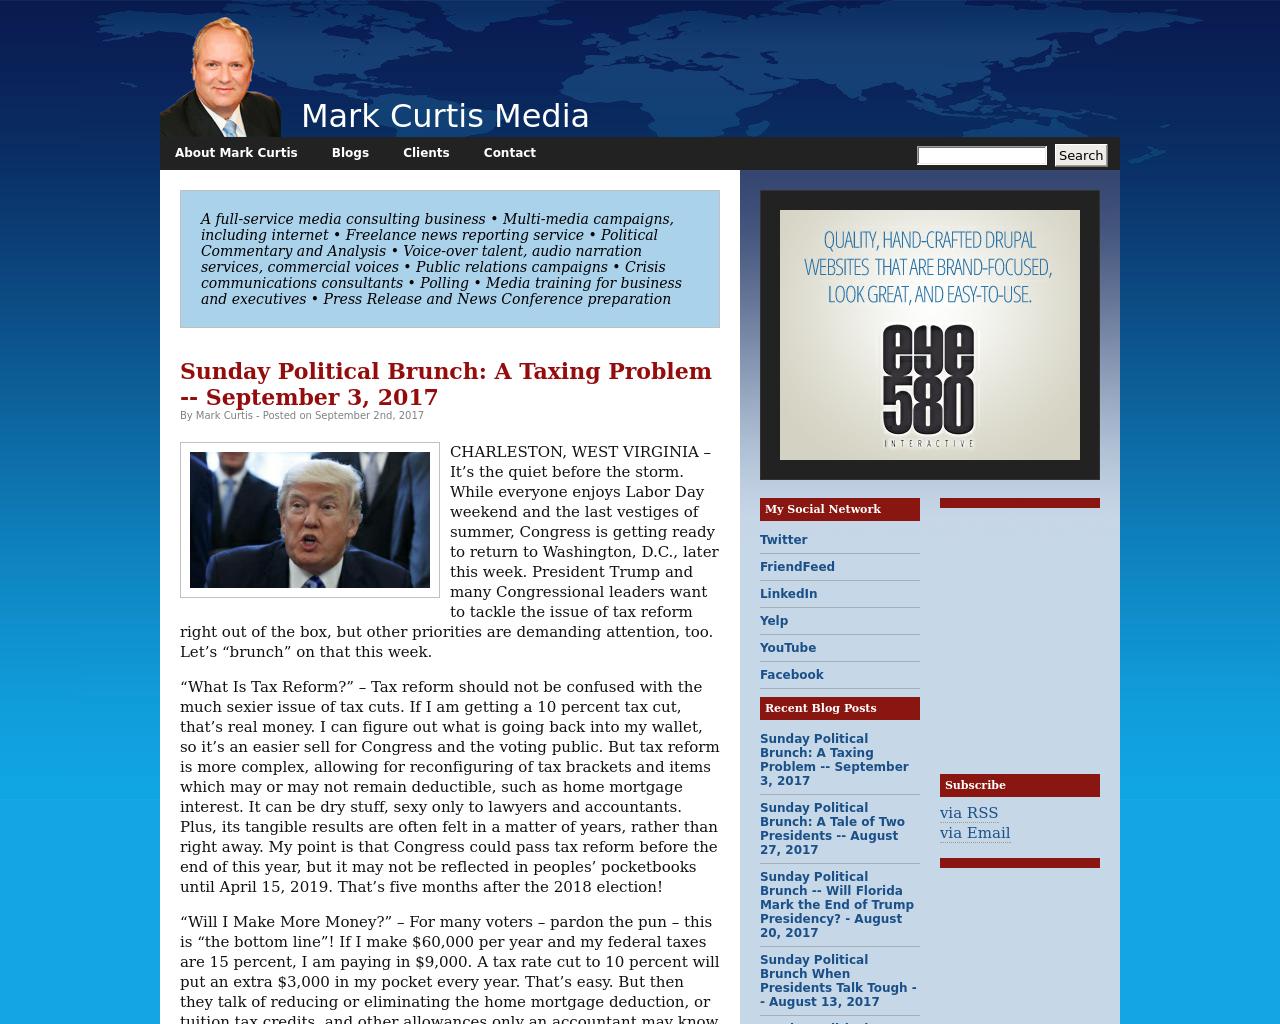 Mark-Curtis-Media-Advertising-Reviews-Pricing